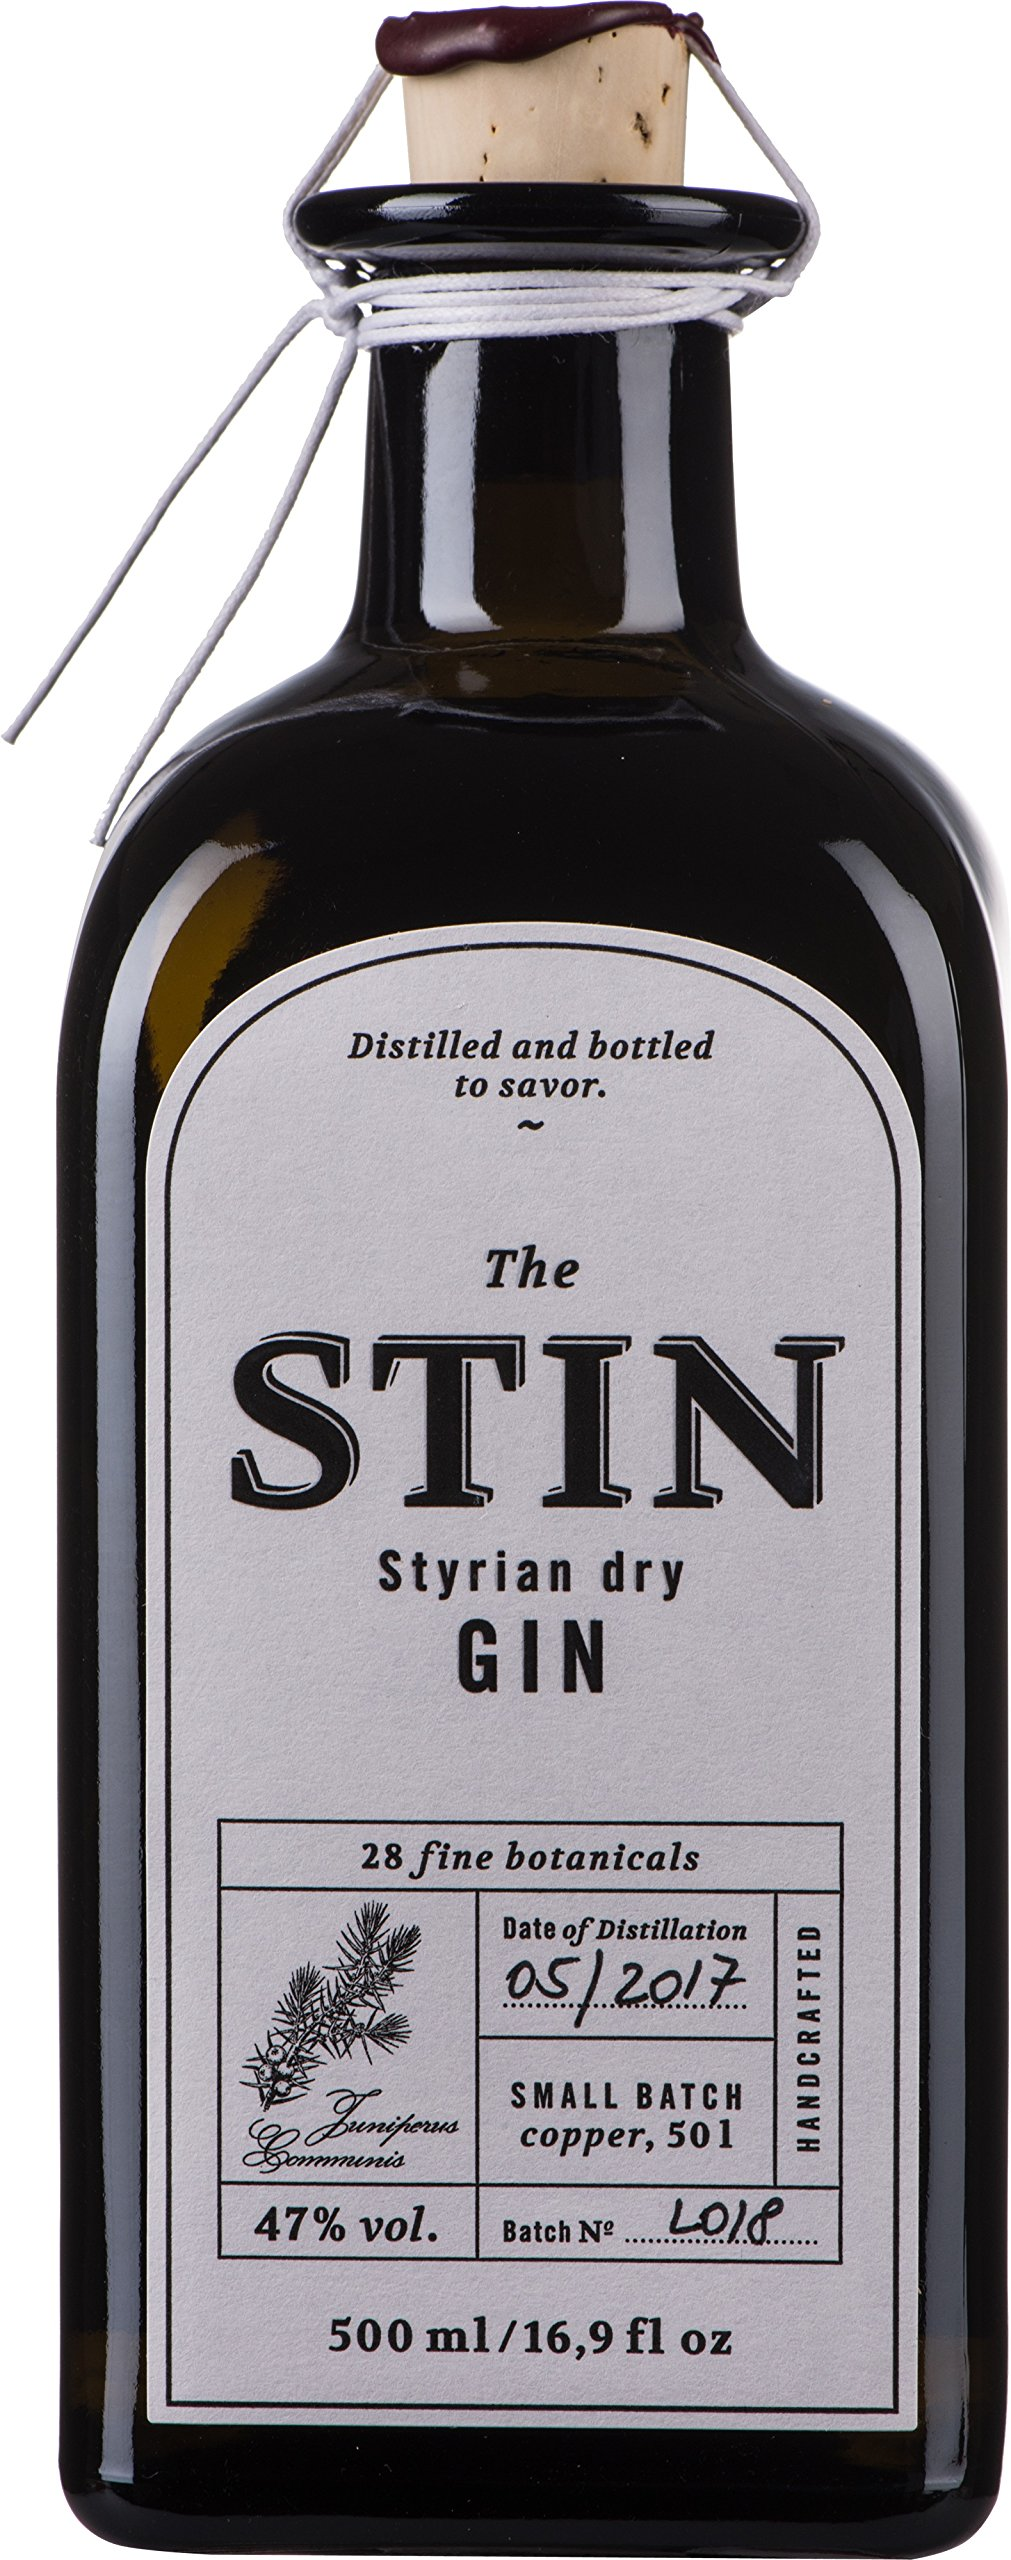 Stin-Styrian-dry-Gin-1-x-05-l